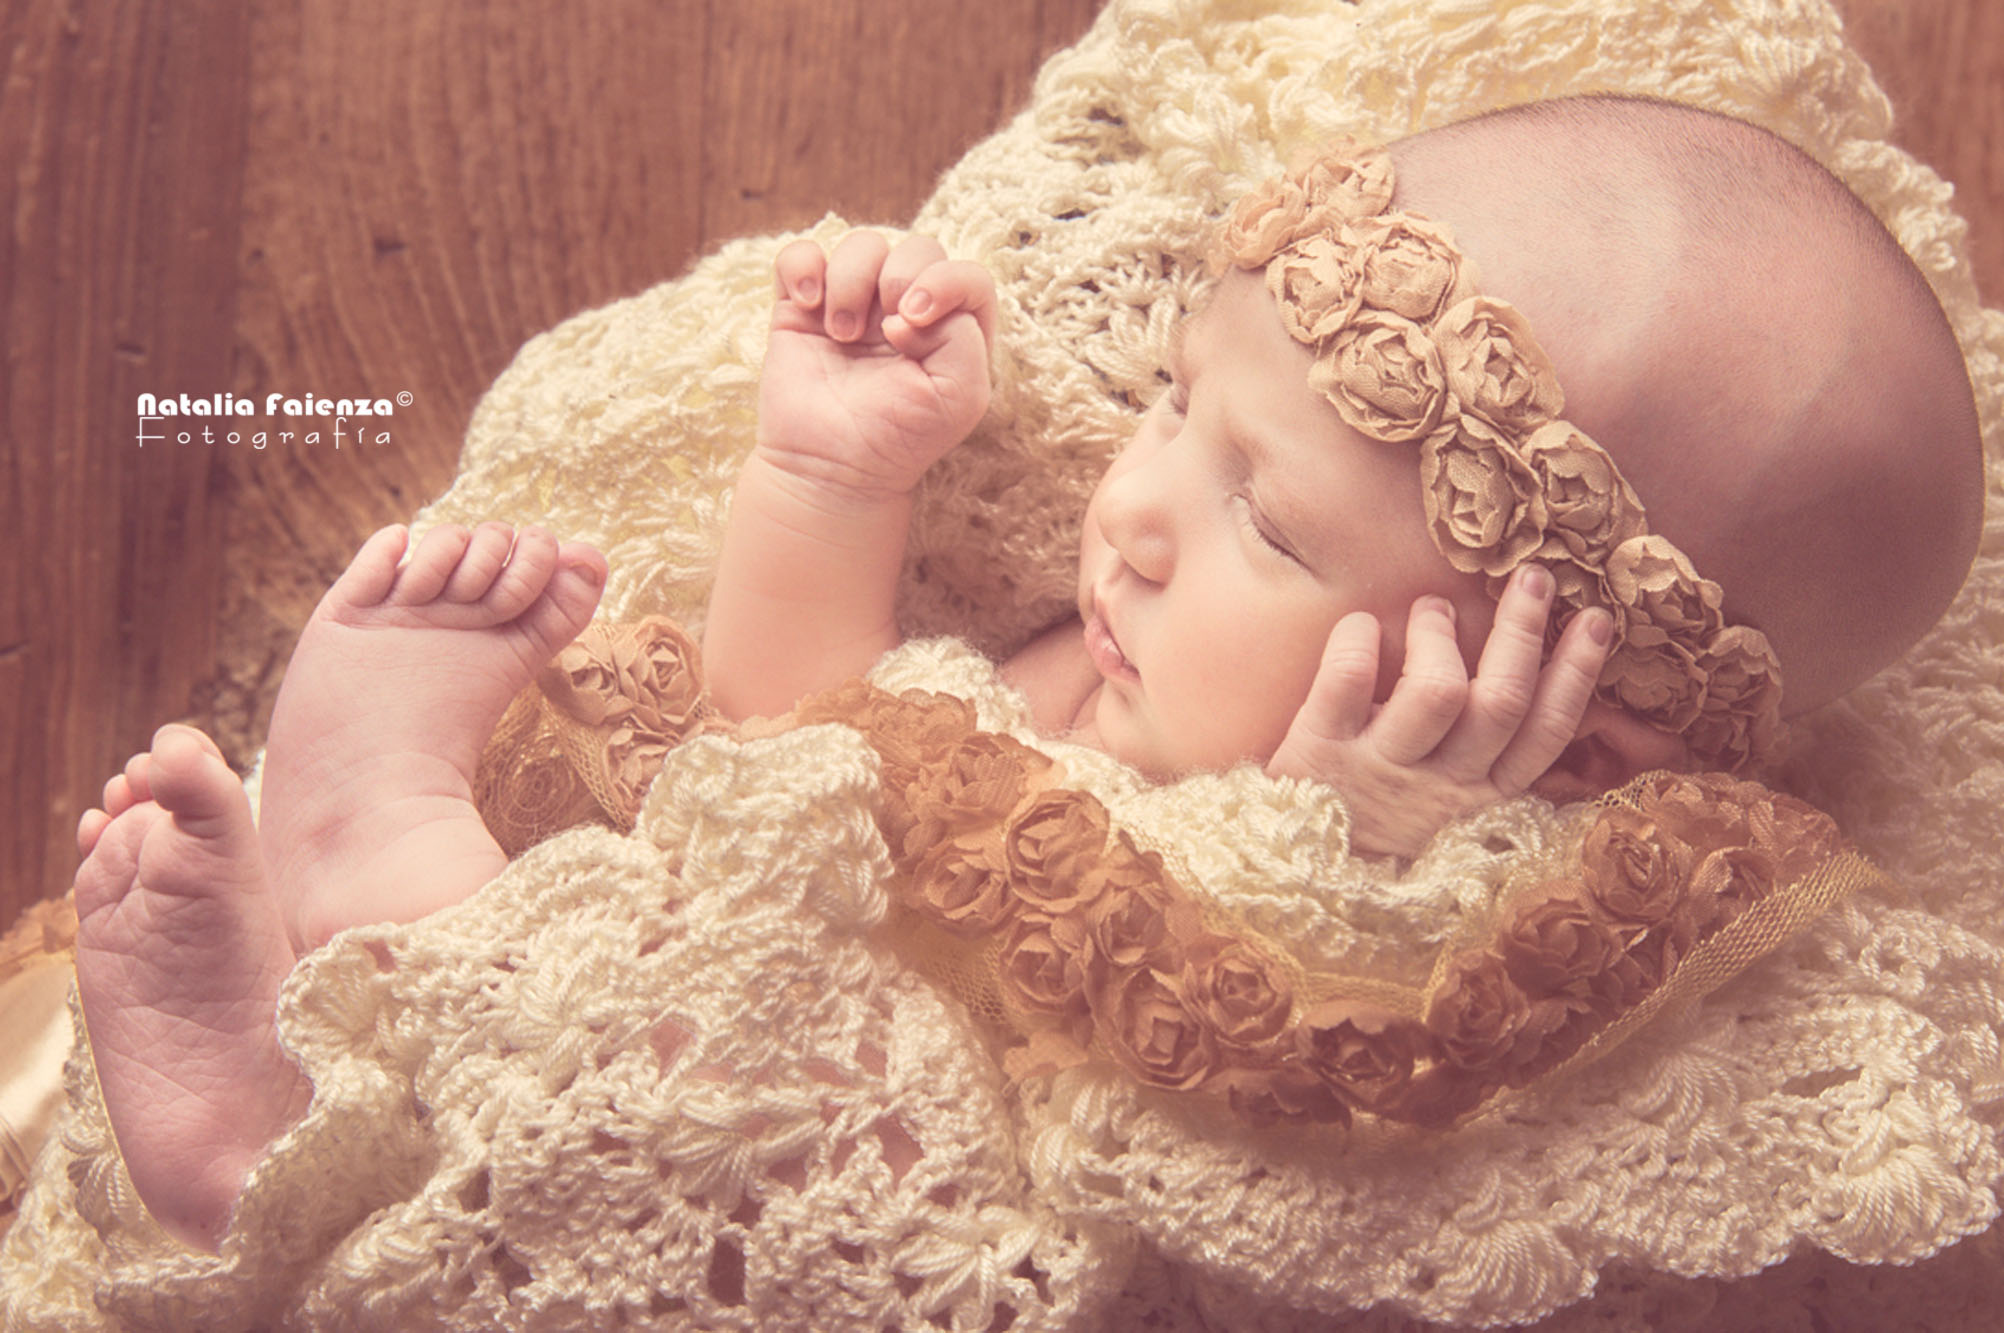 Natalia Faienza Fotografia bebes (5)